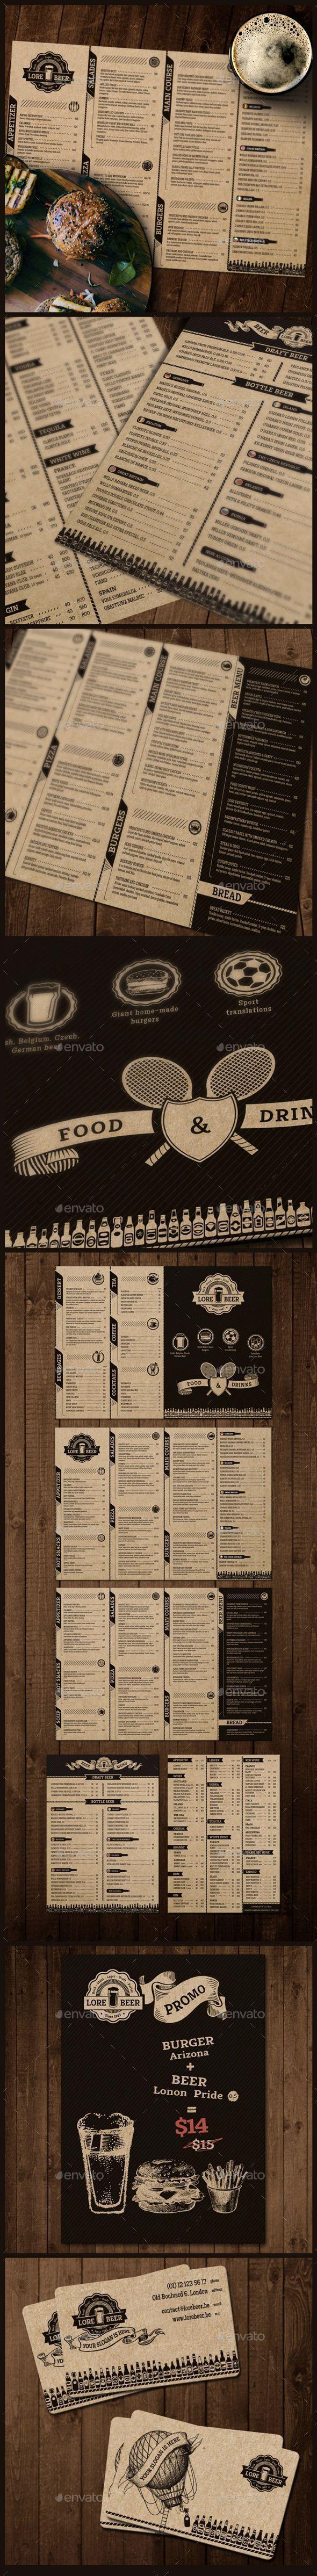 Lore Beer Pub Template #design #alimentationmenu Download: http://graphicriver.net/item/lore-beer-pub/12239806?ref=ksioks